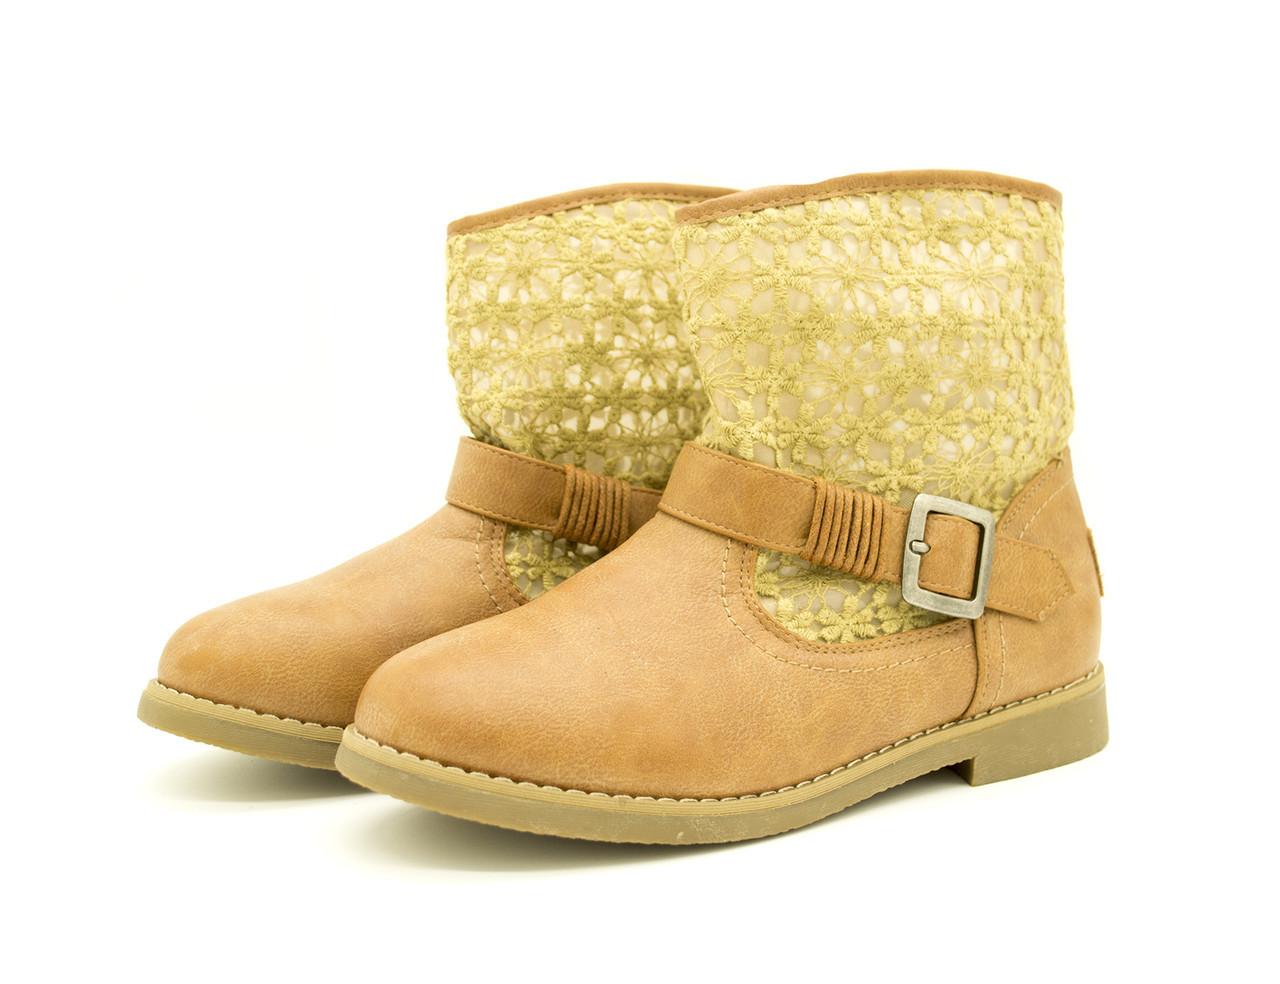 Ботинки Coolway для девочки 39 размер демисезон